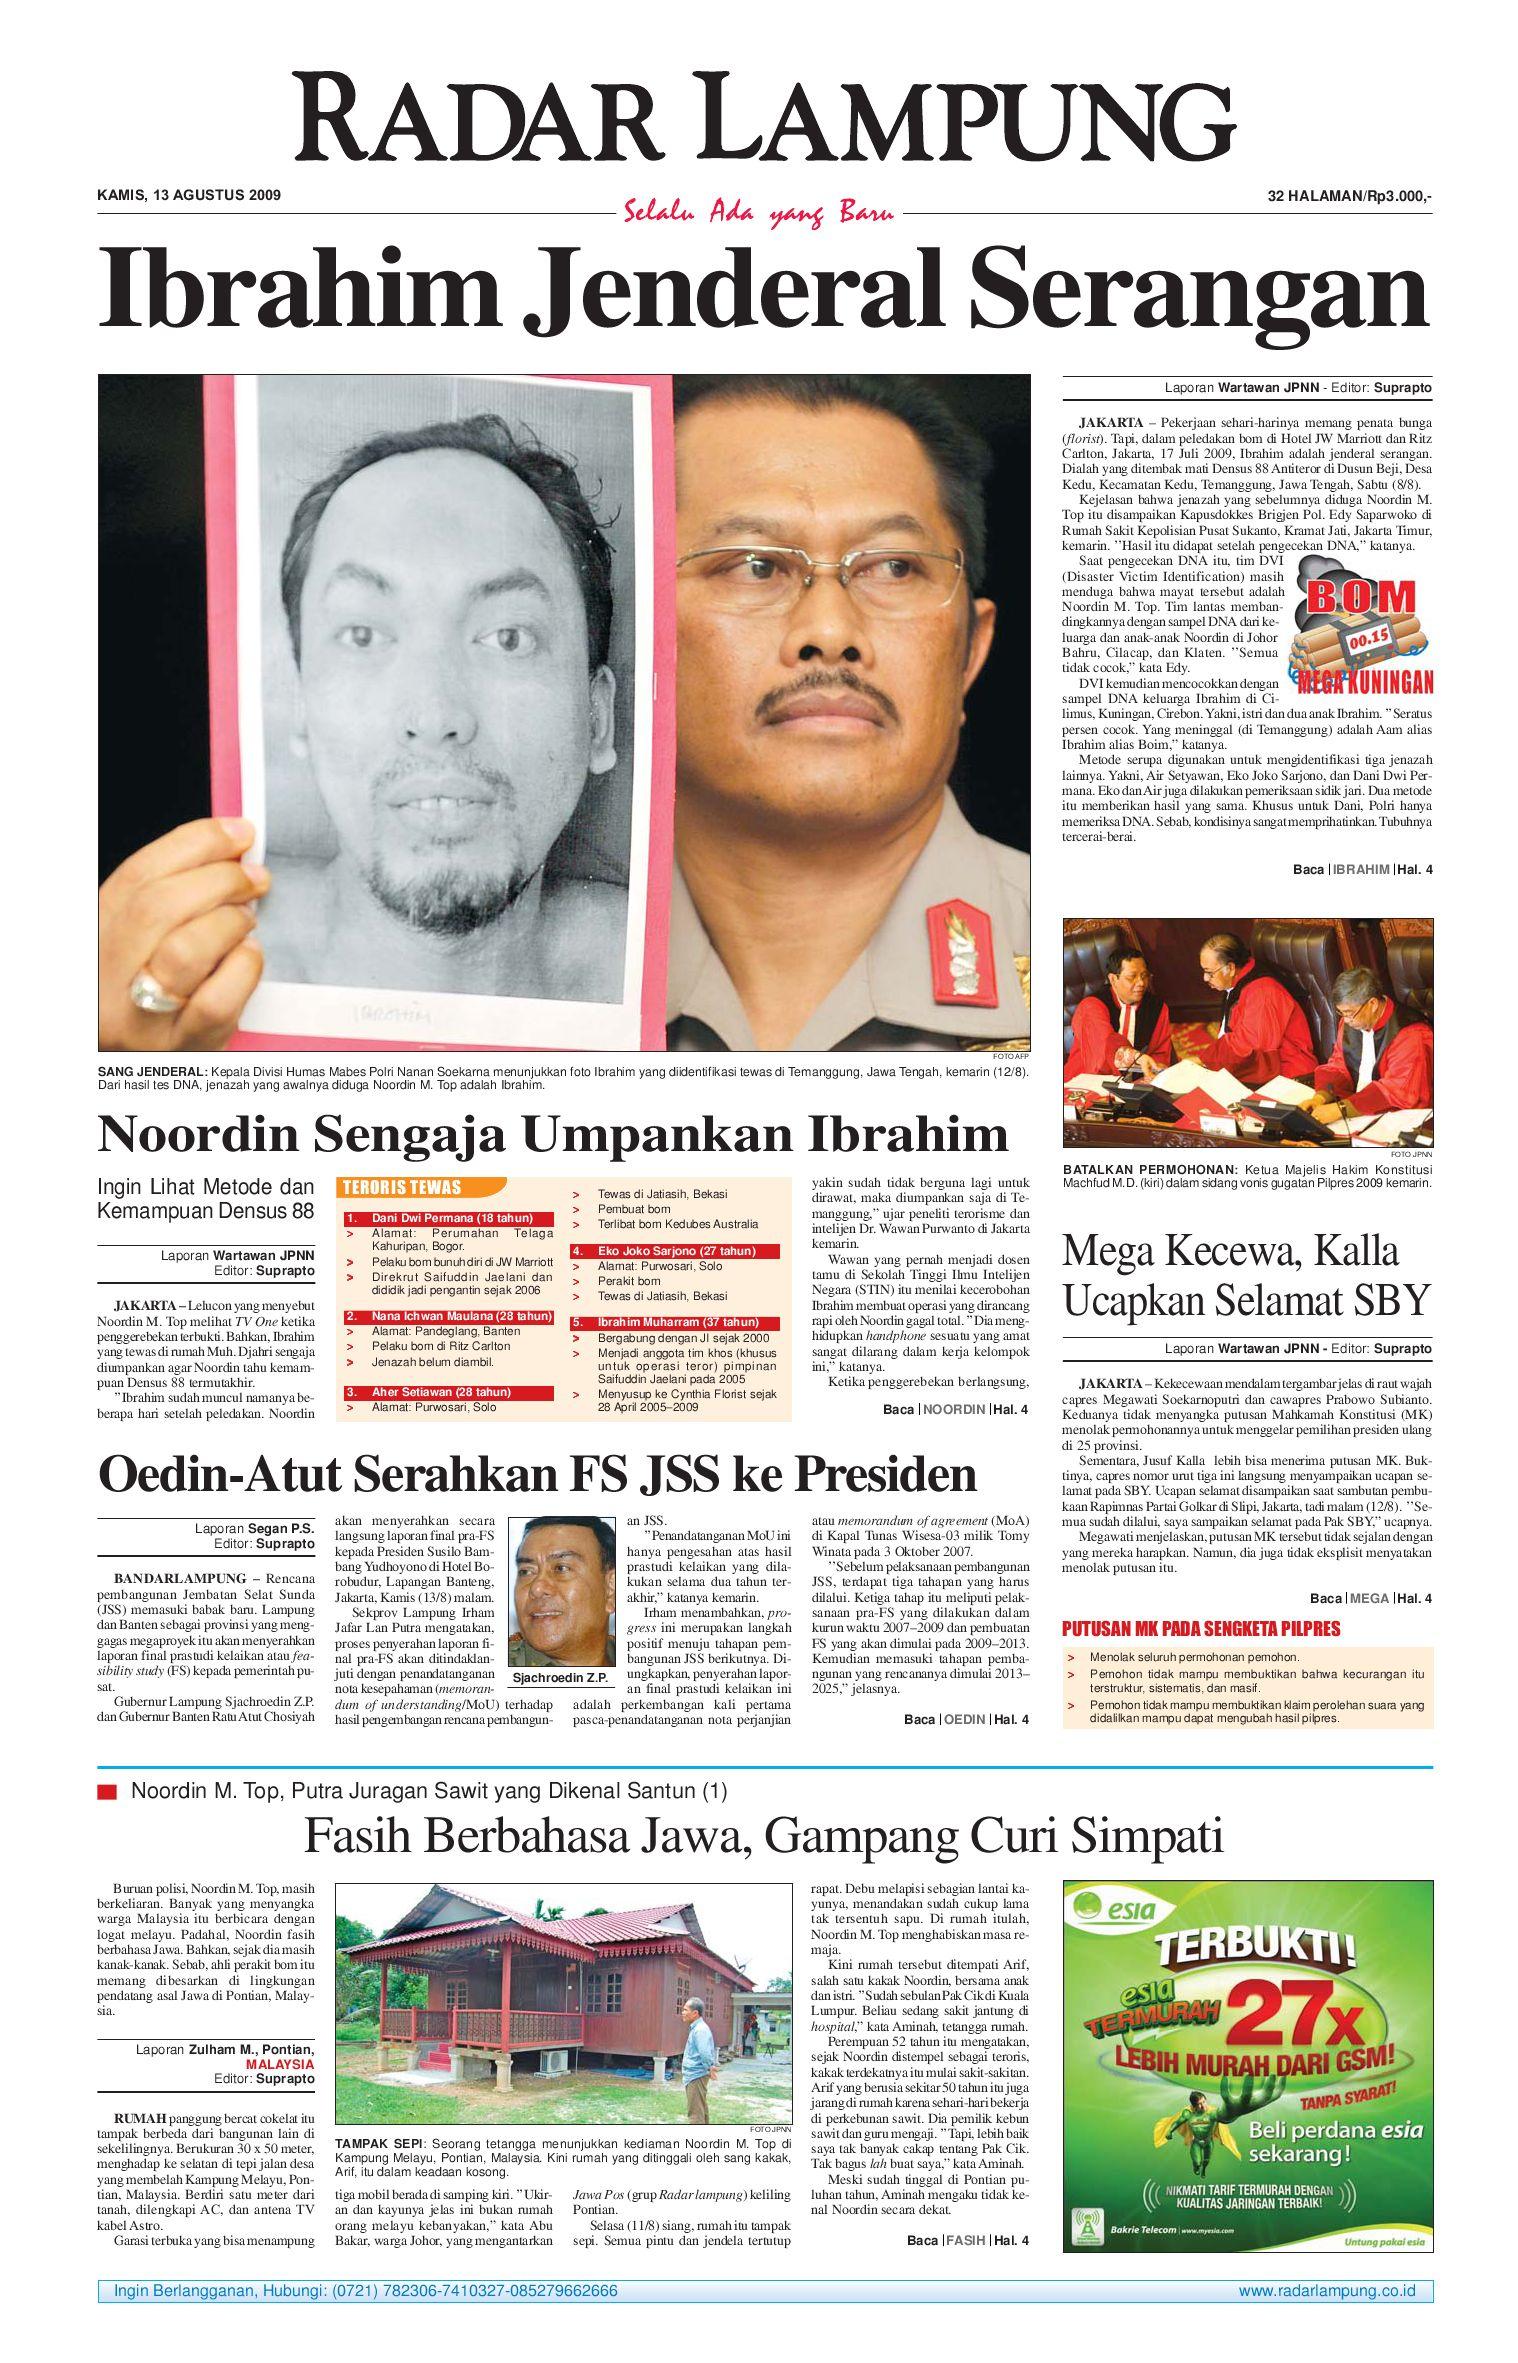 Radar Lampung Kamis 13 Agustus 2009 By Issuu Tcash Vaganza 34 Kripiss Medan Manis